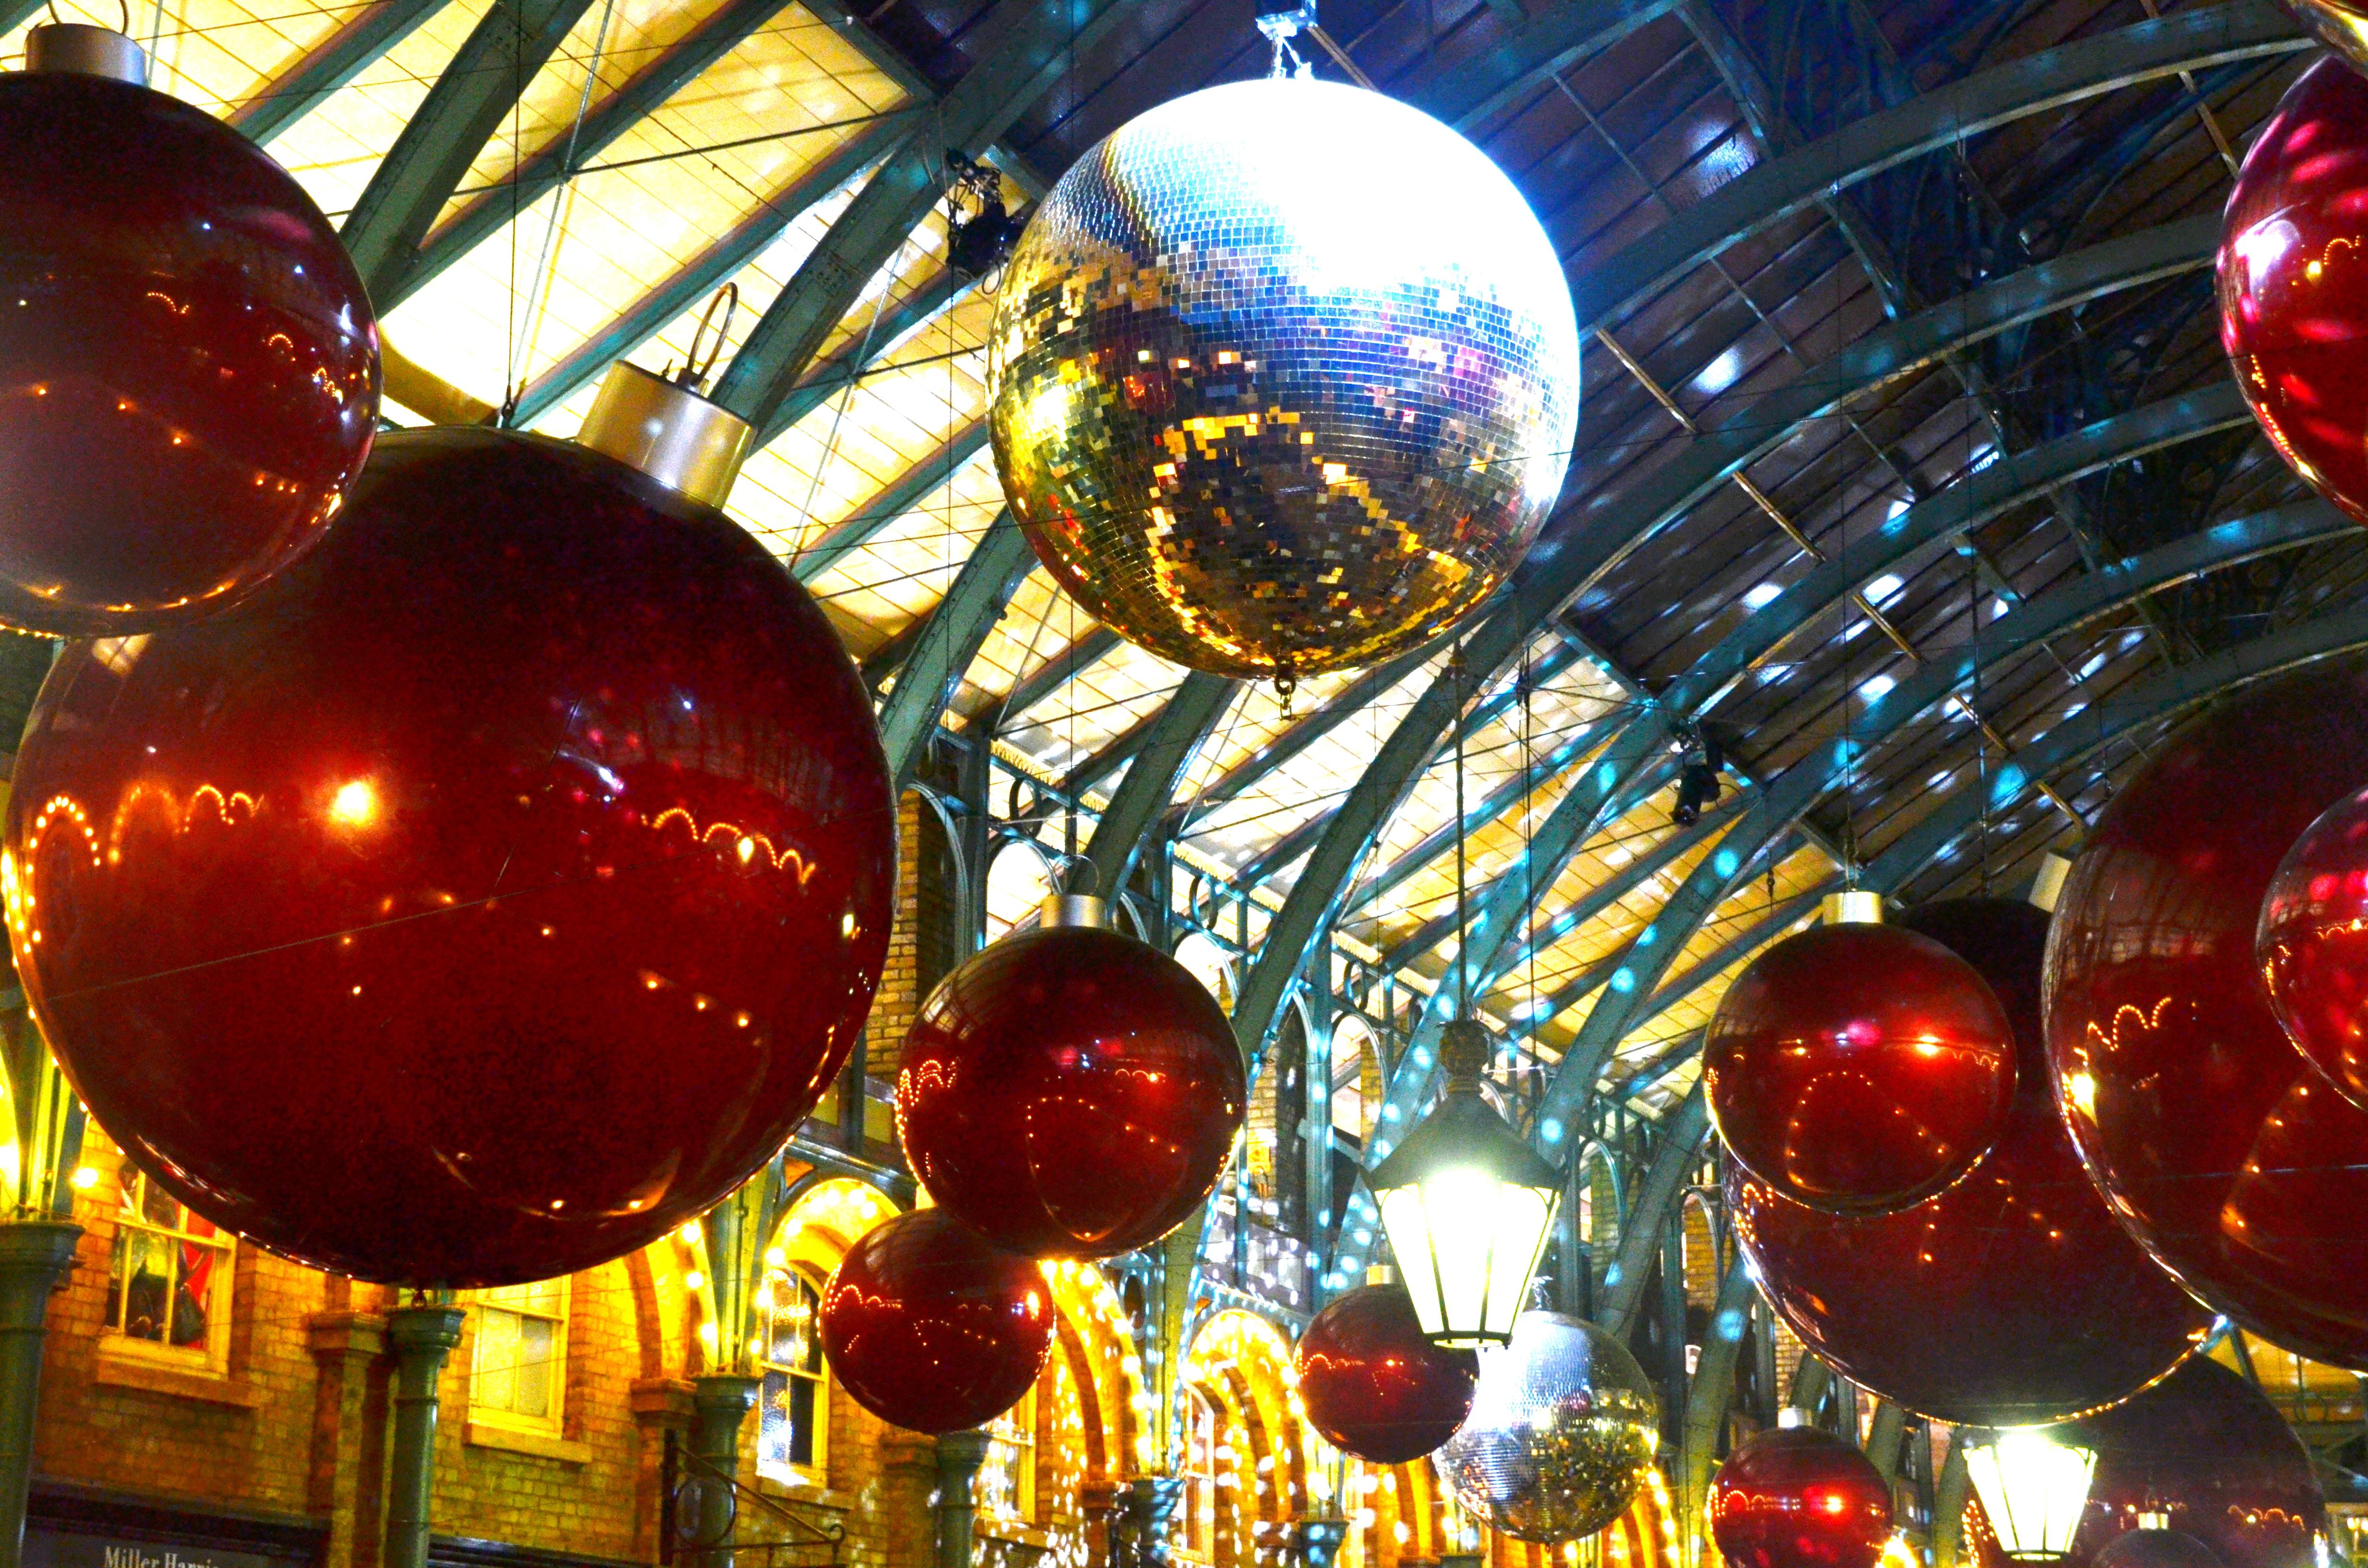 Decorazioni Natalizie Londra.Addobbi Natalizi A Londra Luci Mercatini E Giganteschi Alberi Di Natale One Two Frida